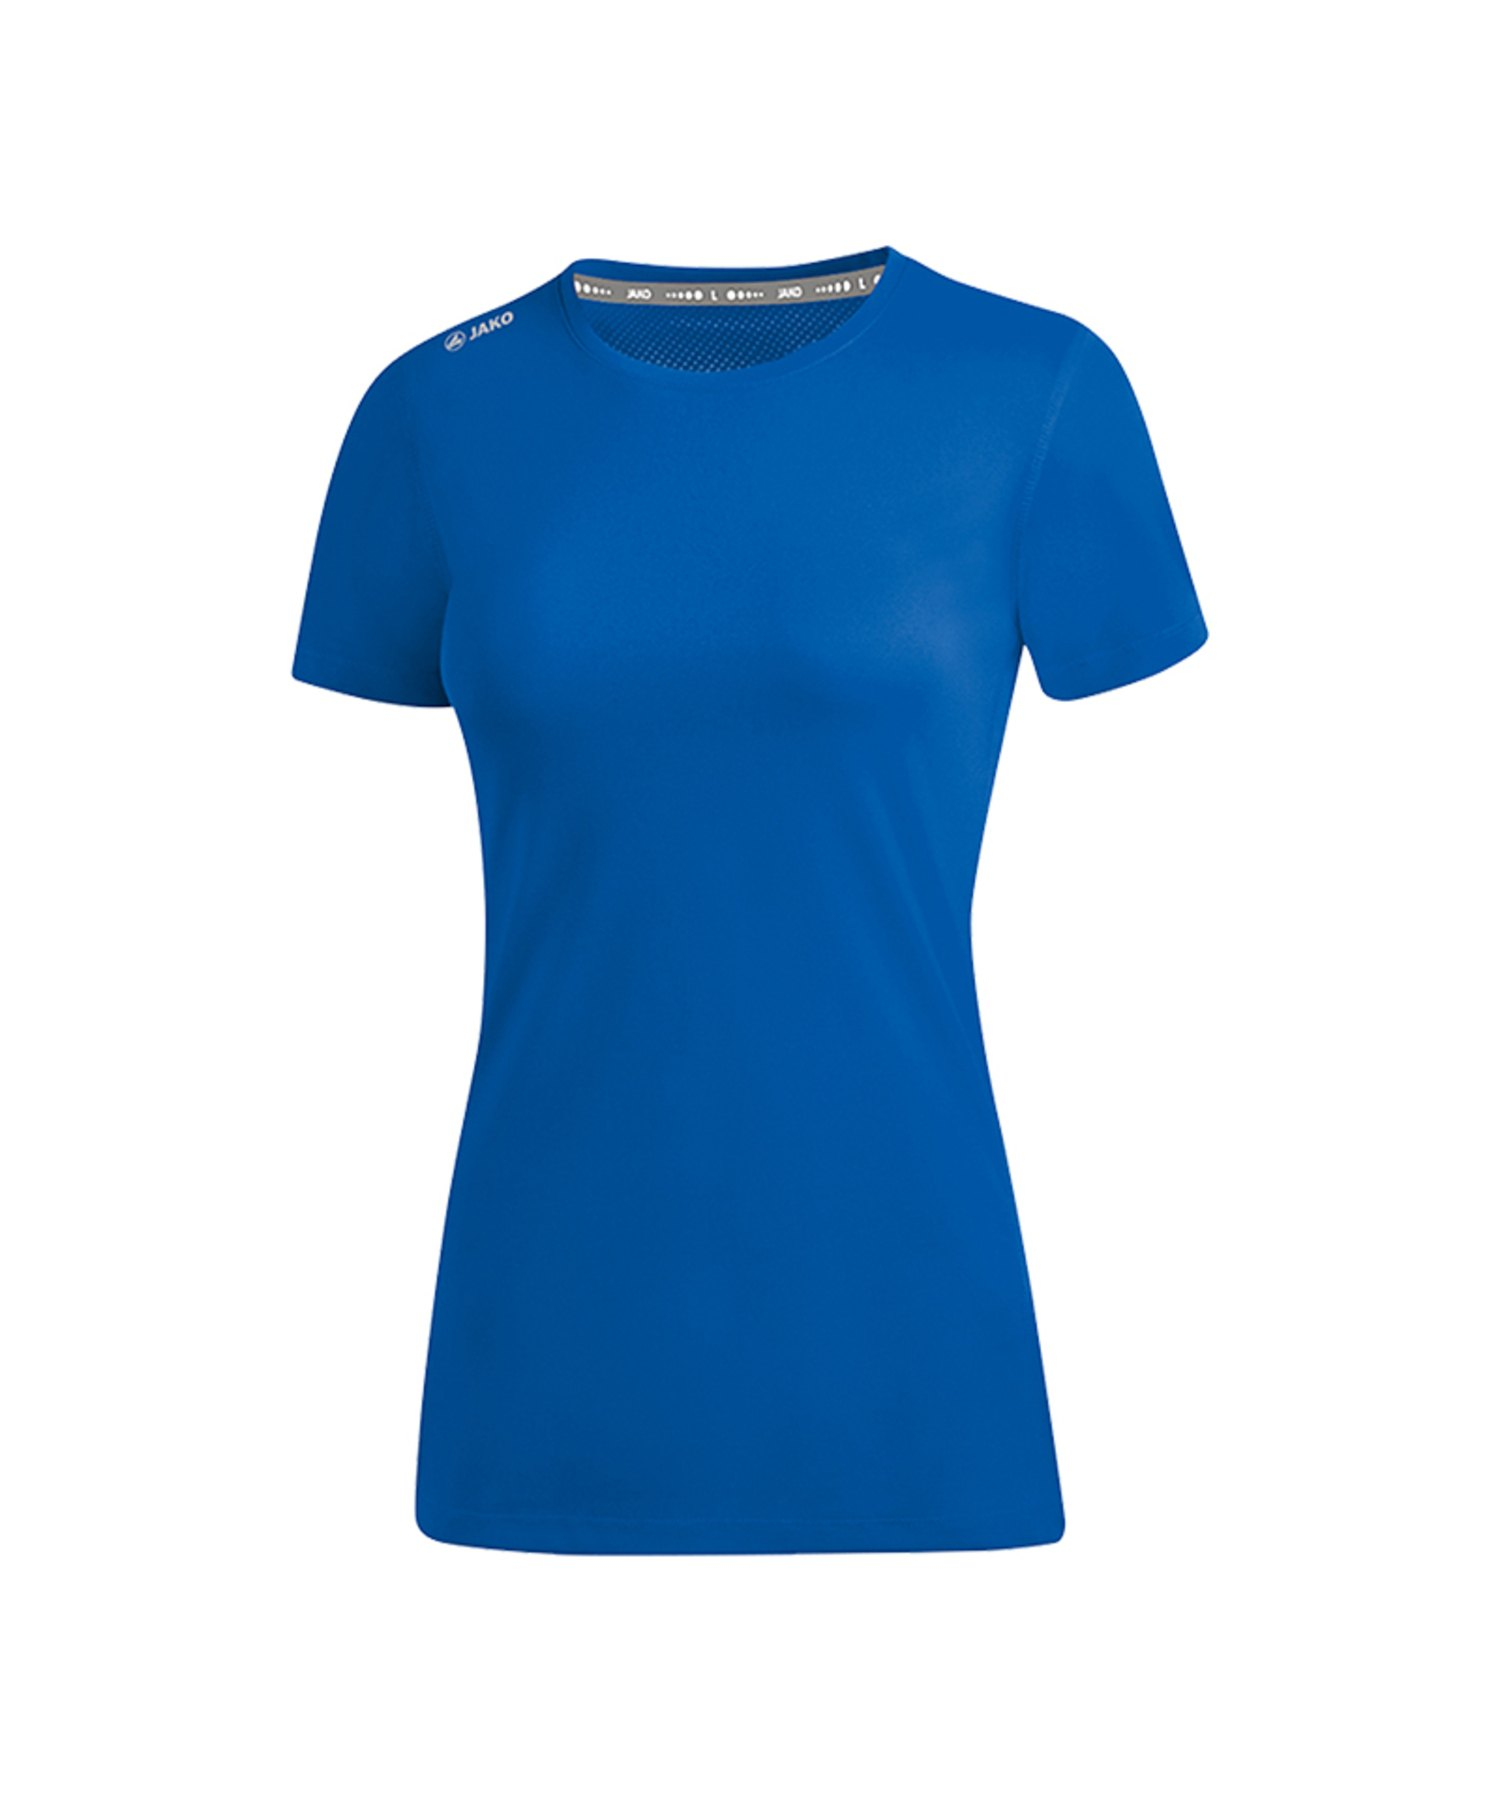 Jako Run 2.0 T-Shirt Running Damen Blau F04 - Blau